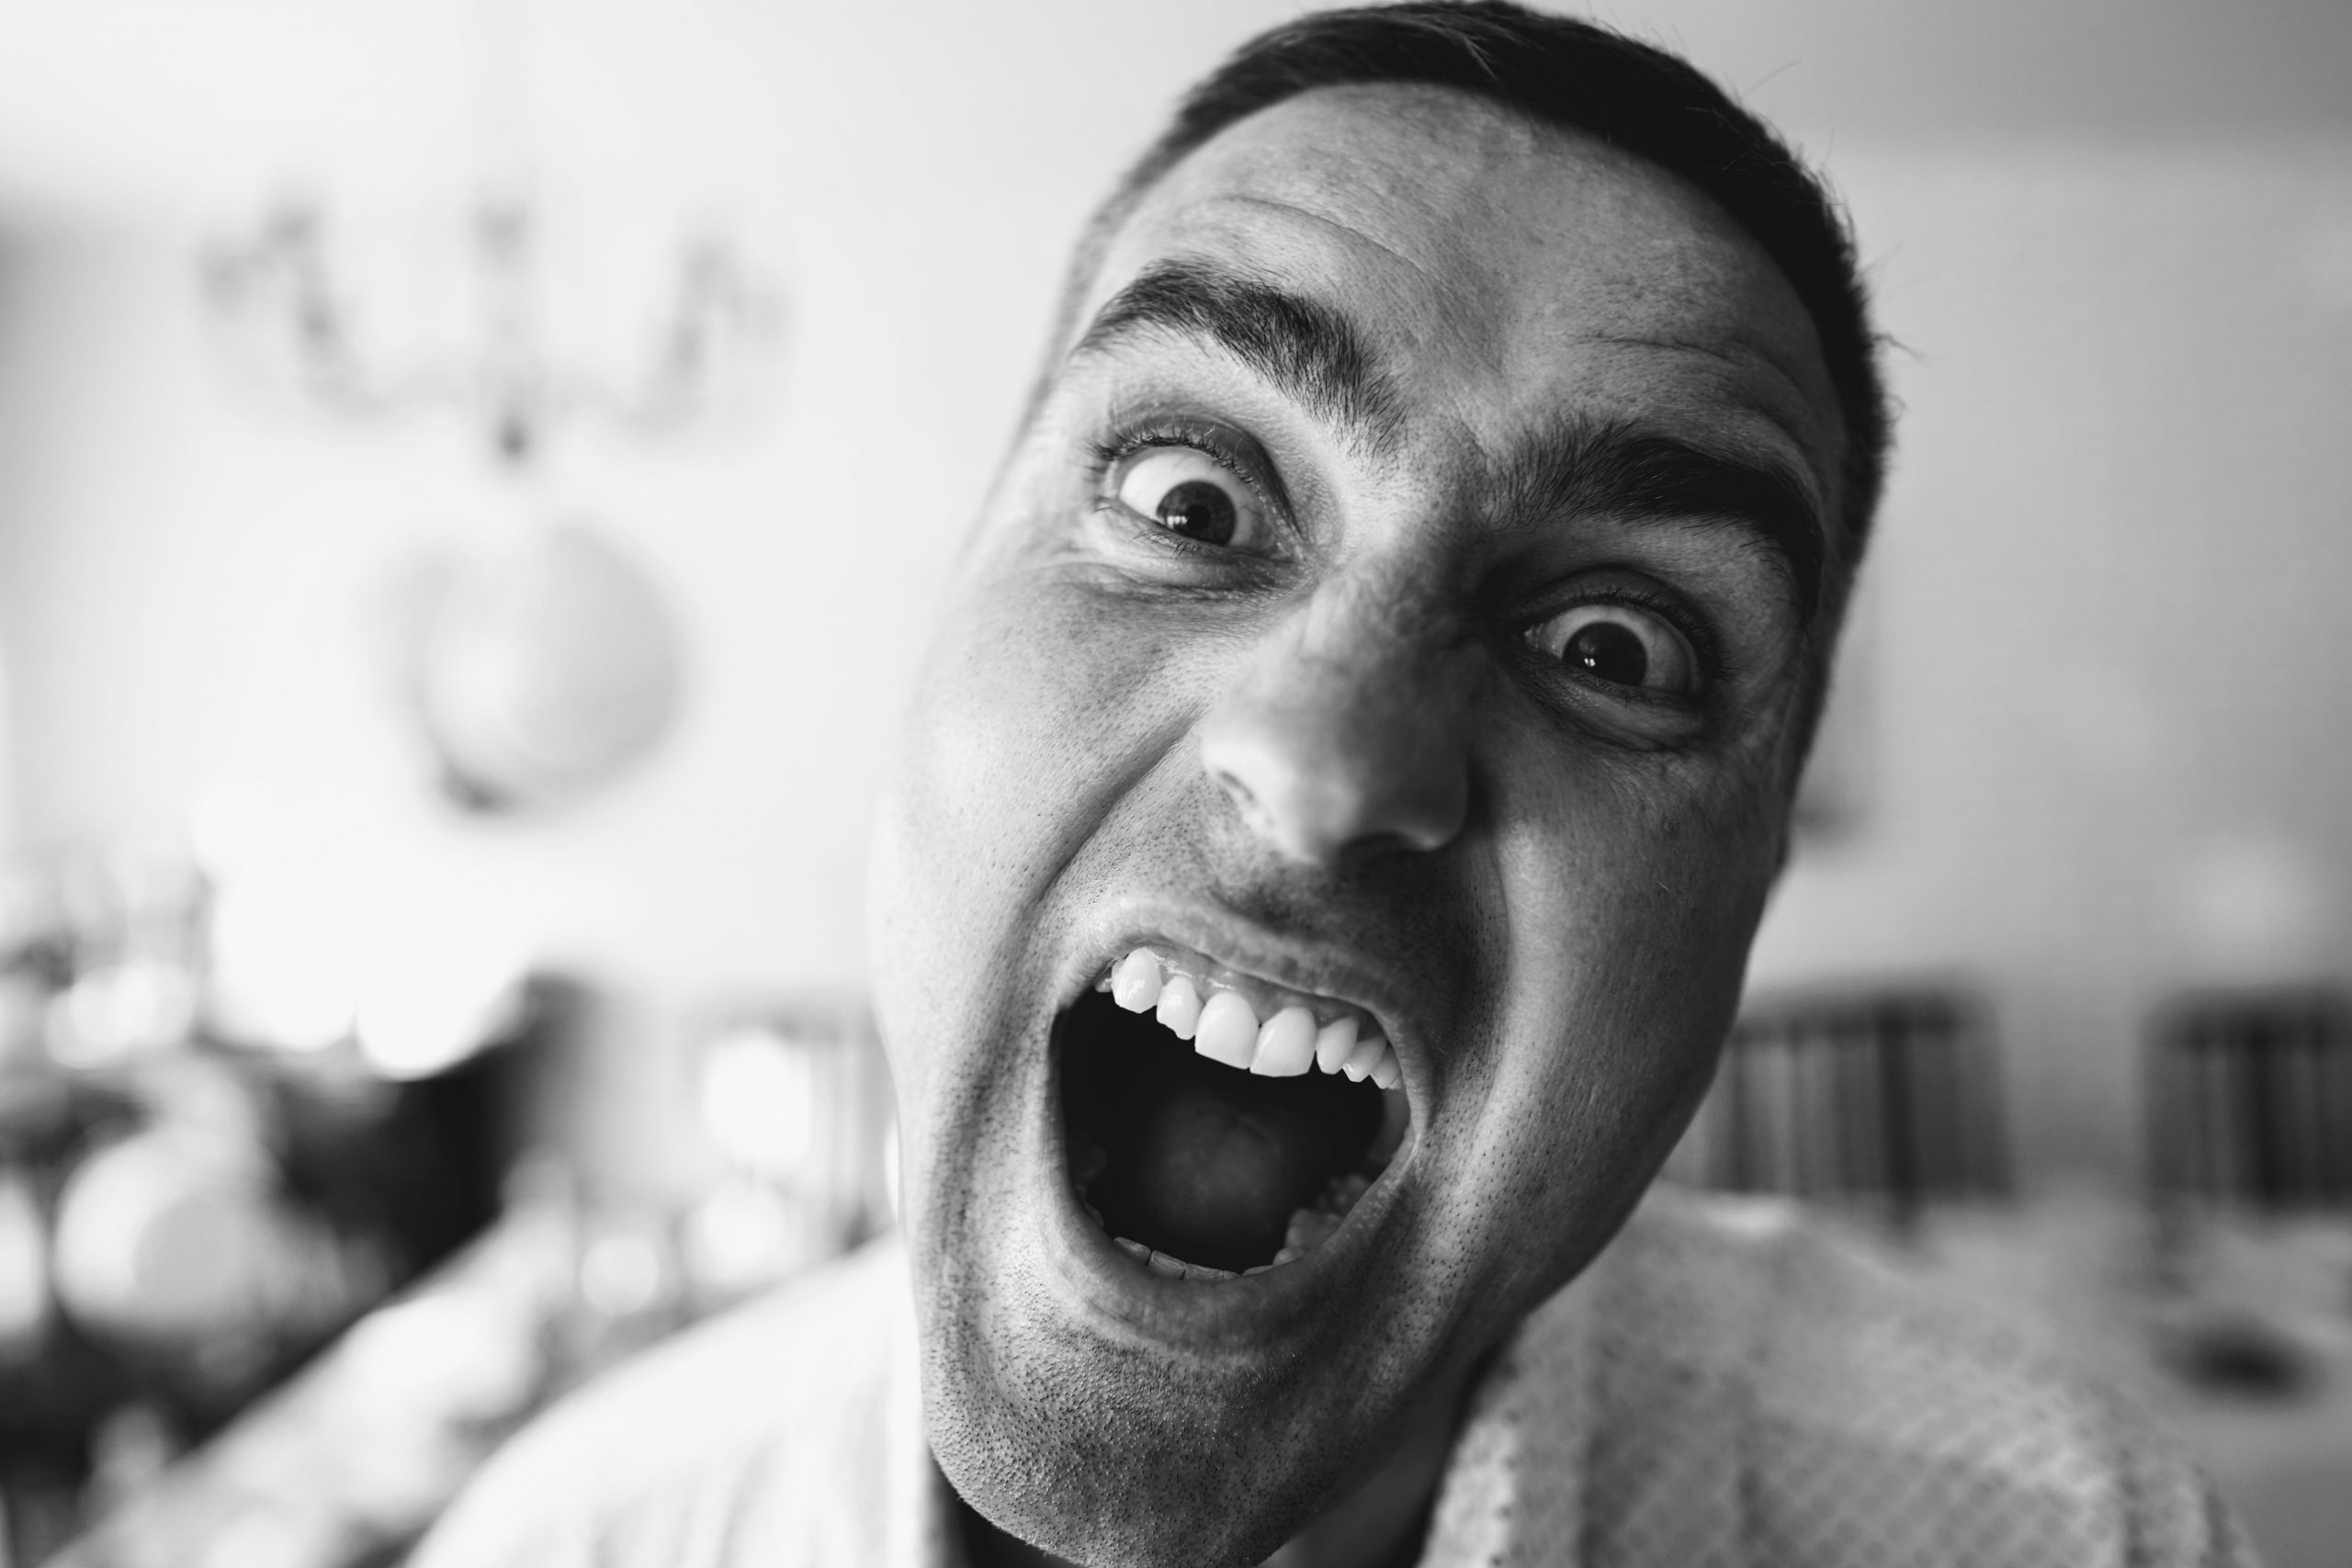 rage, life rage, Timothy Dimoff